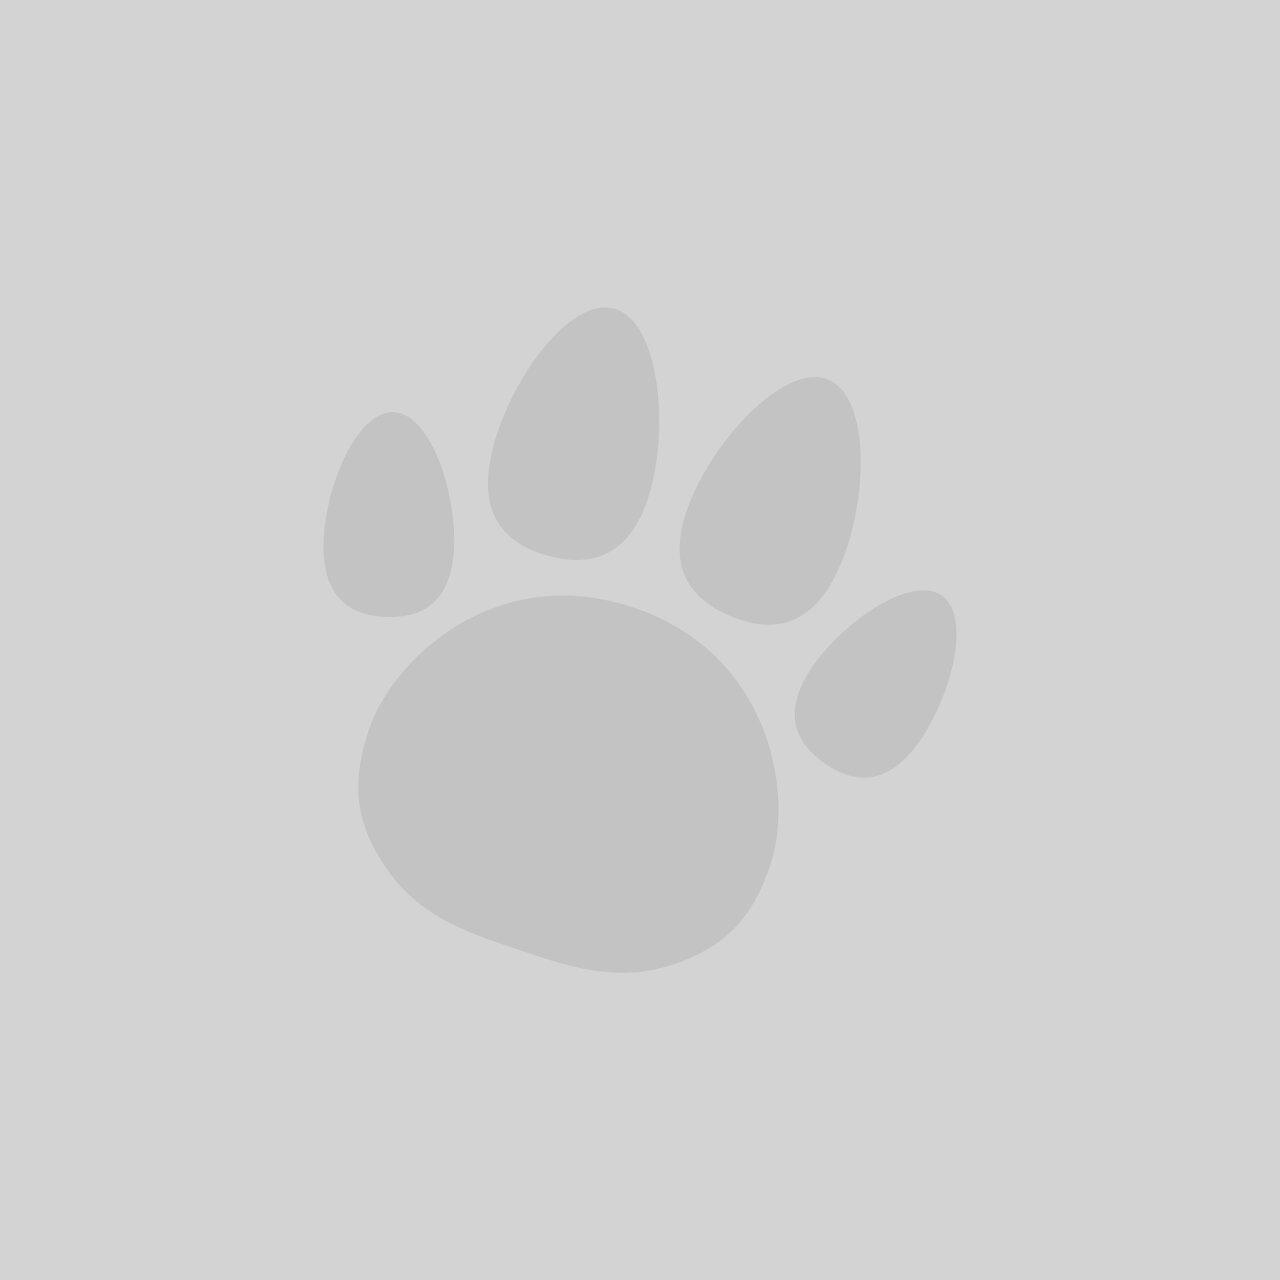 Beaphar Cat Worm Granules 4 x 1g